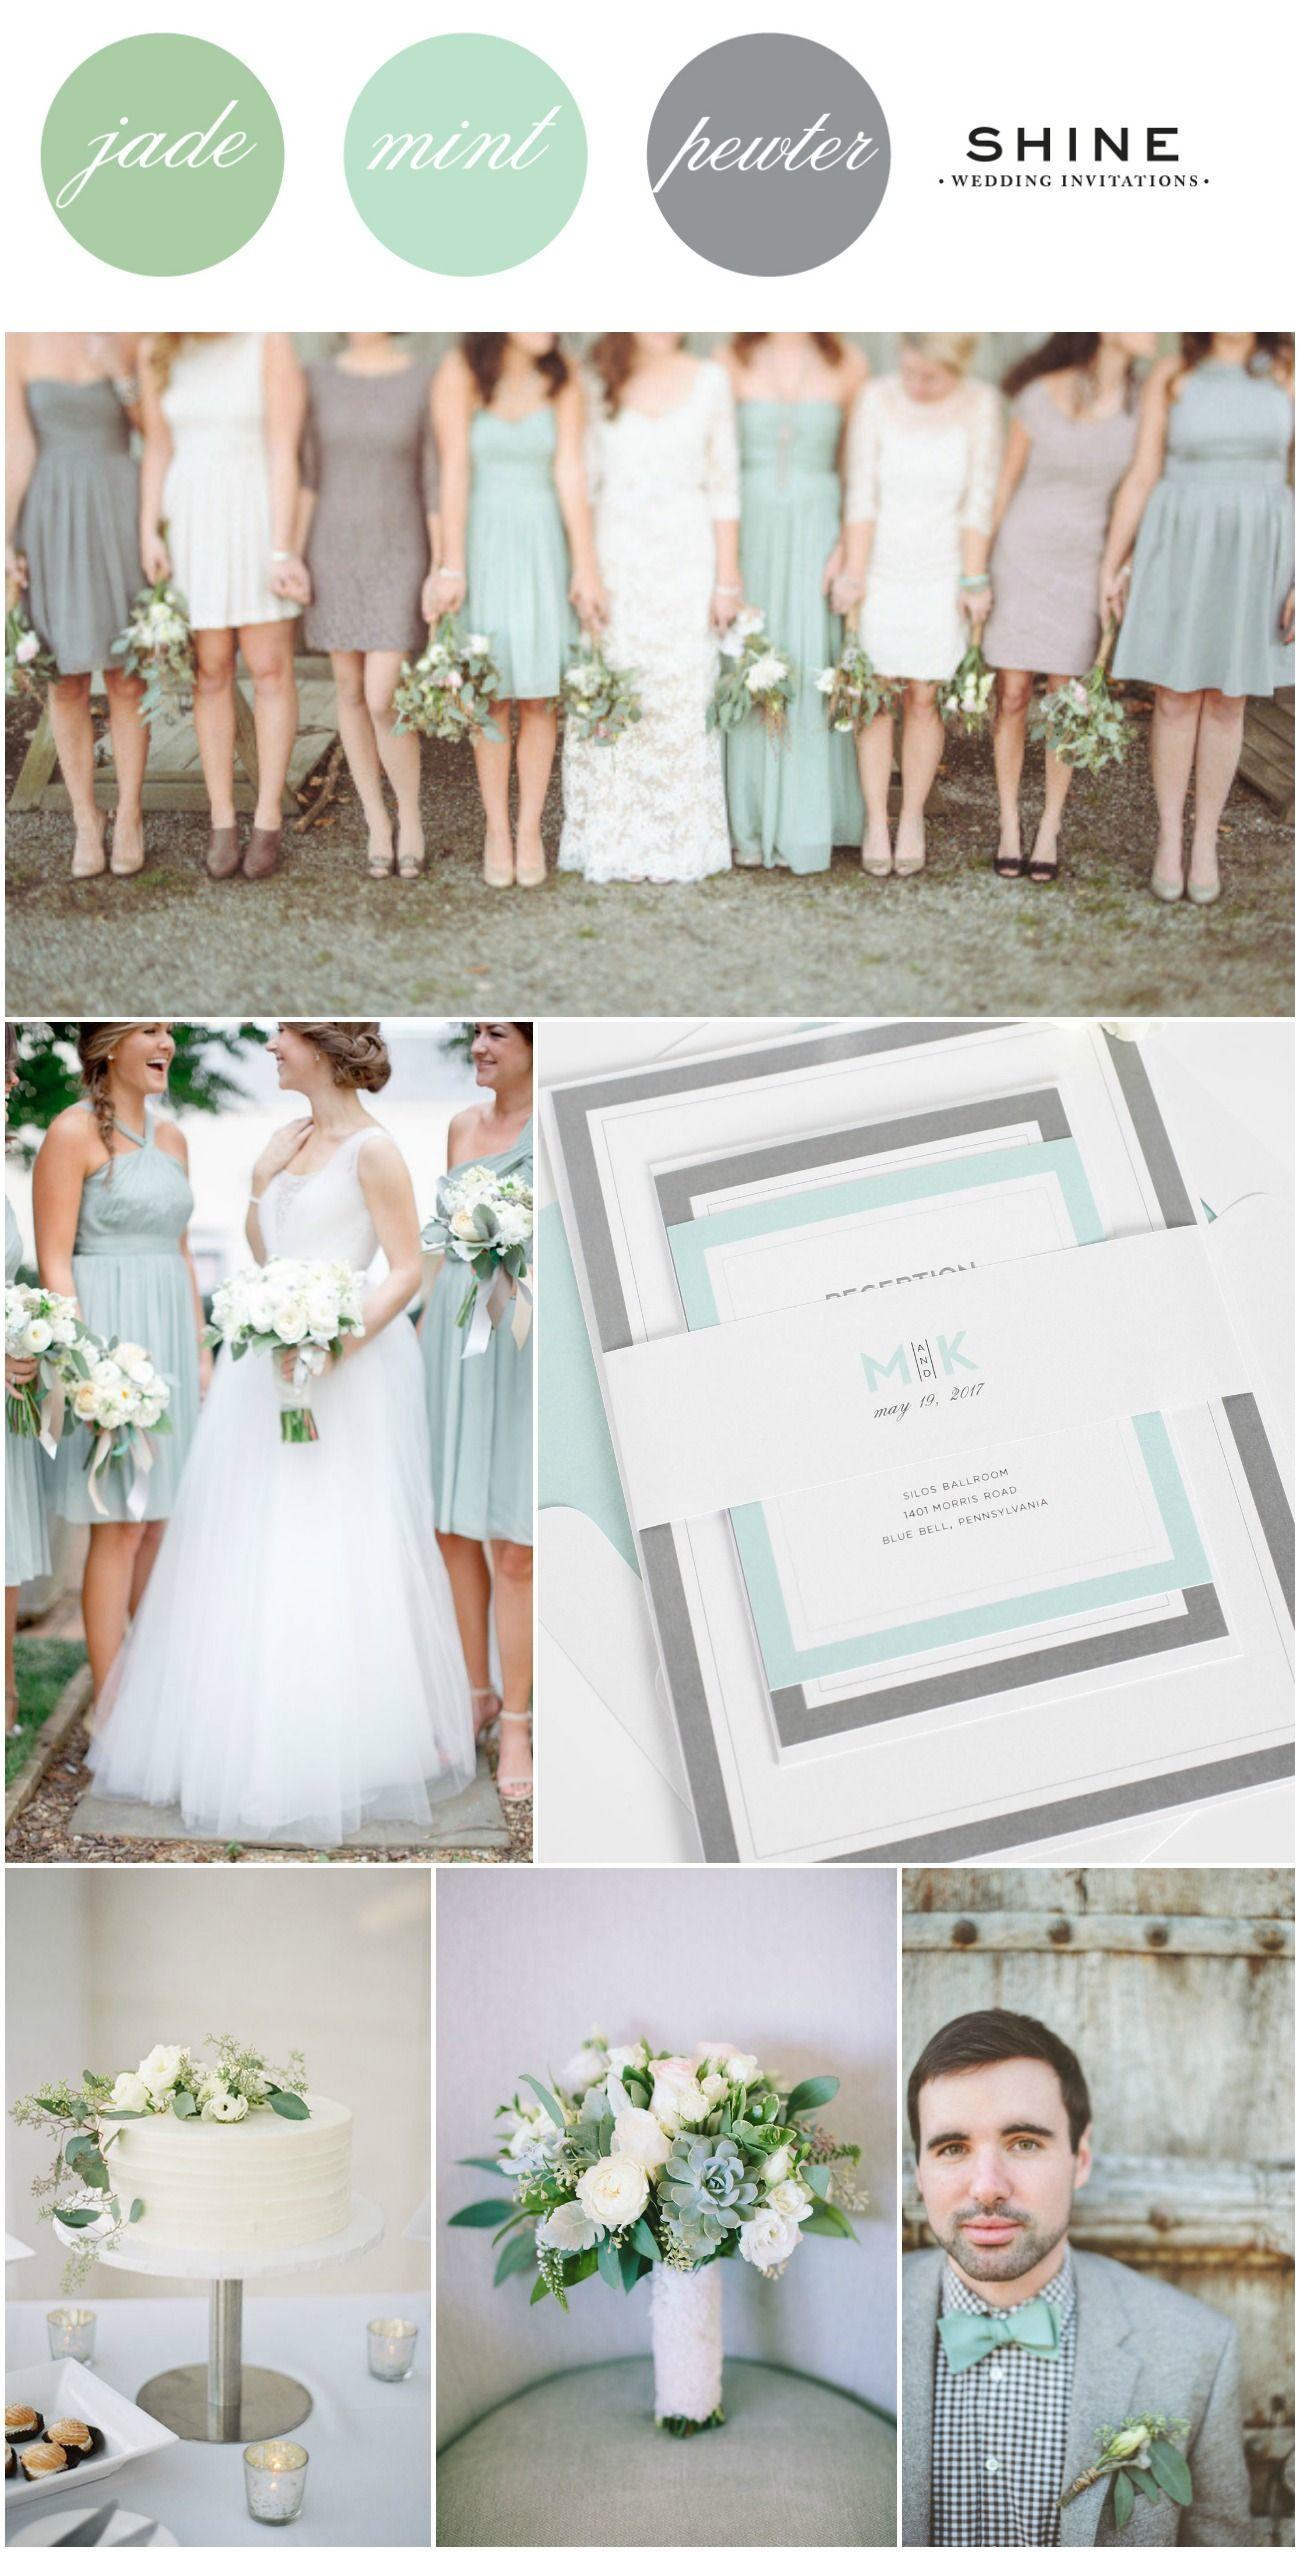 Mint + Jade + Pewter Wedding Inspiration | Pinterest | Shine wedding ...